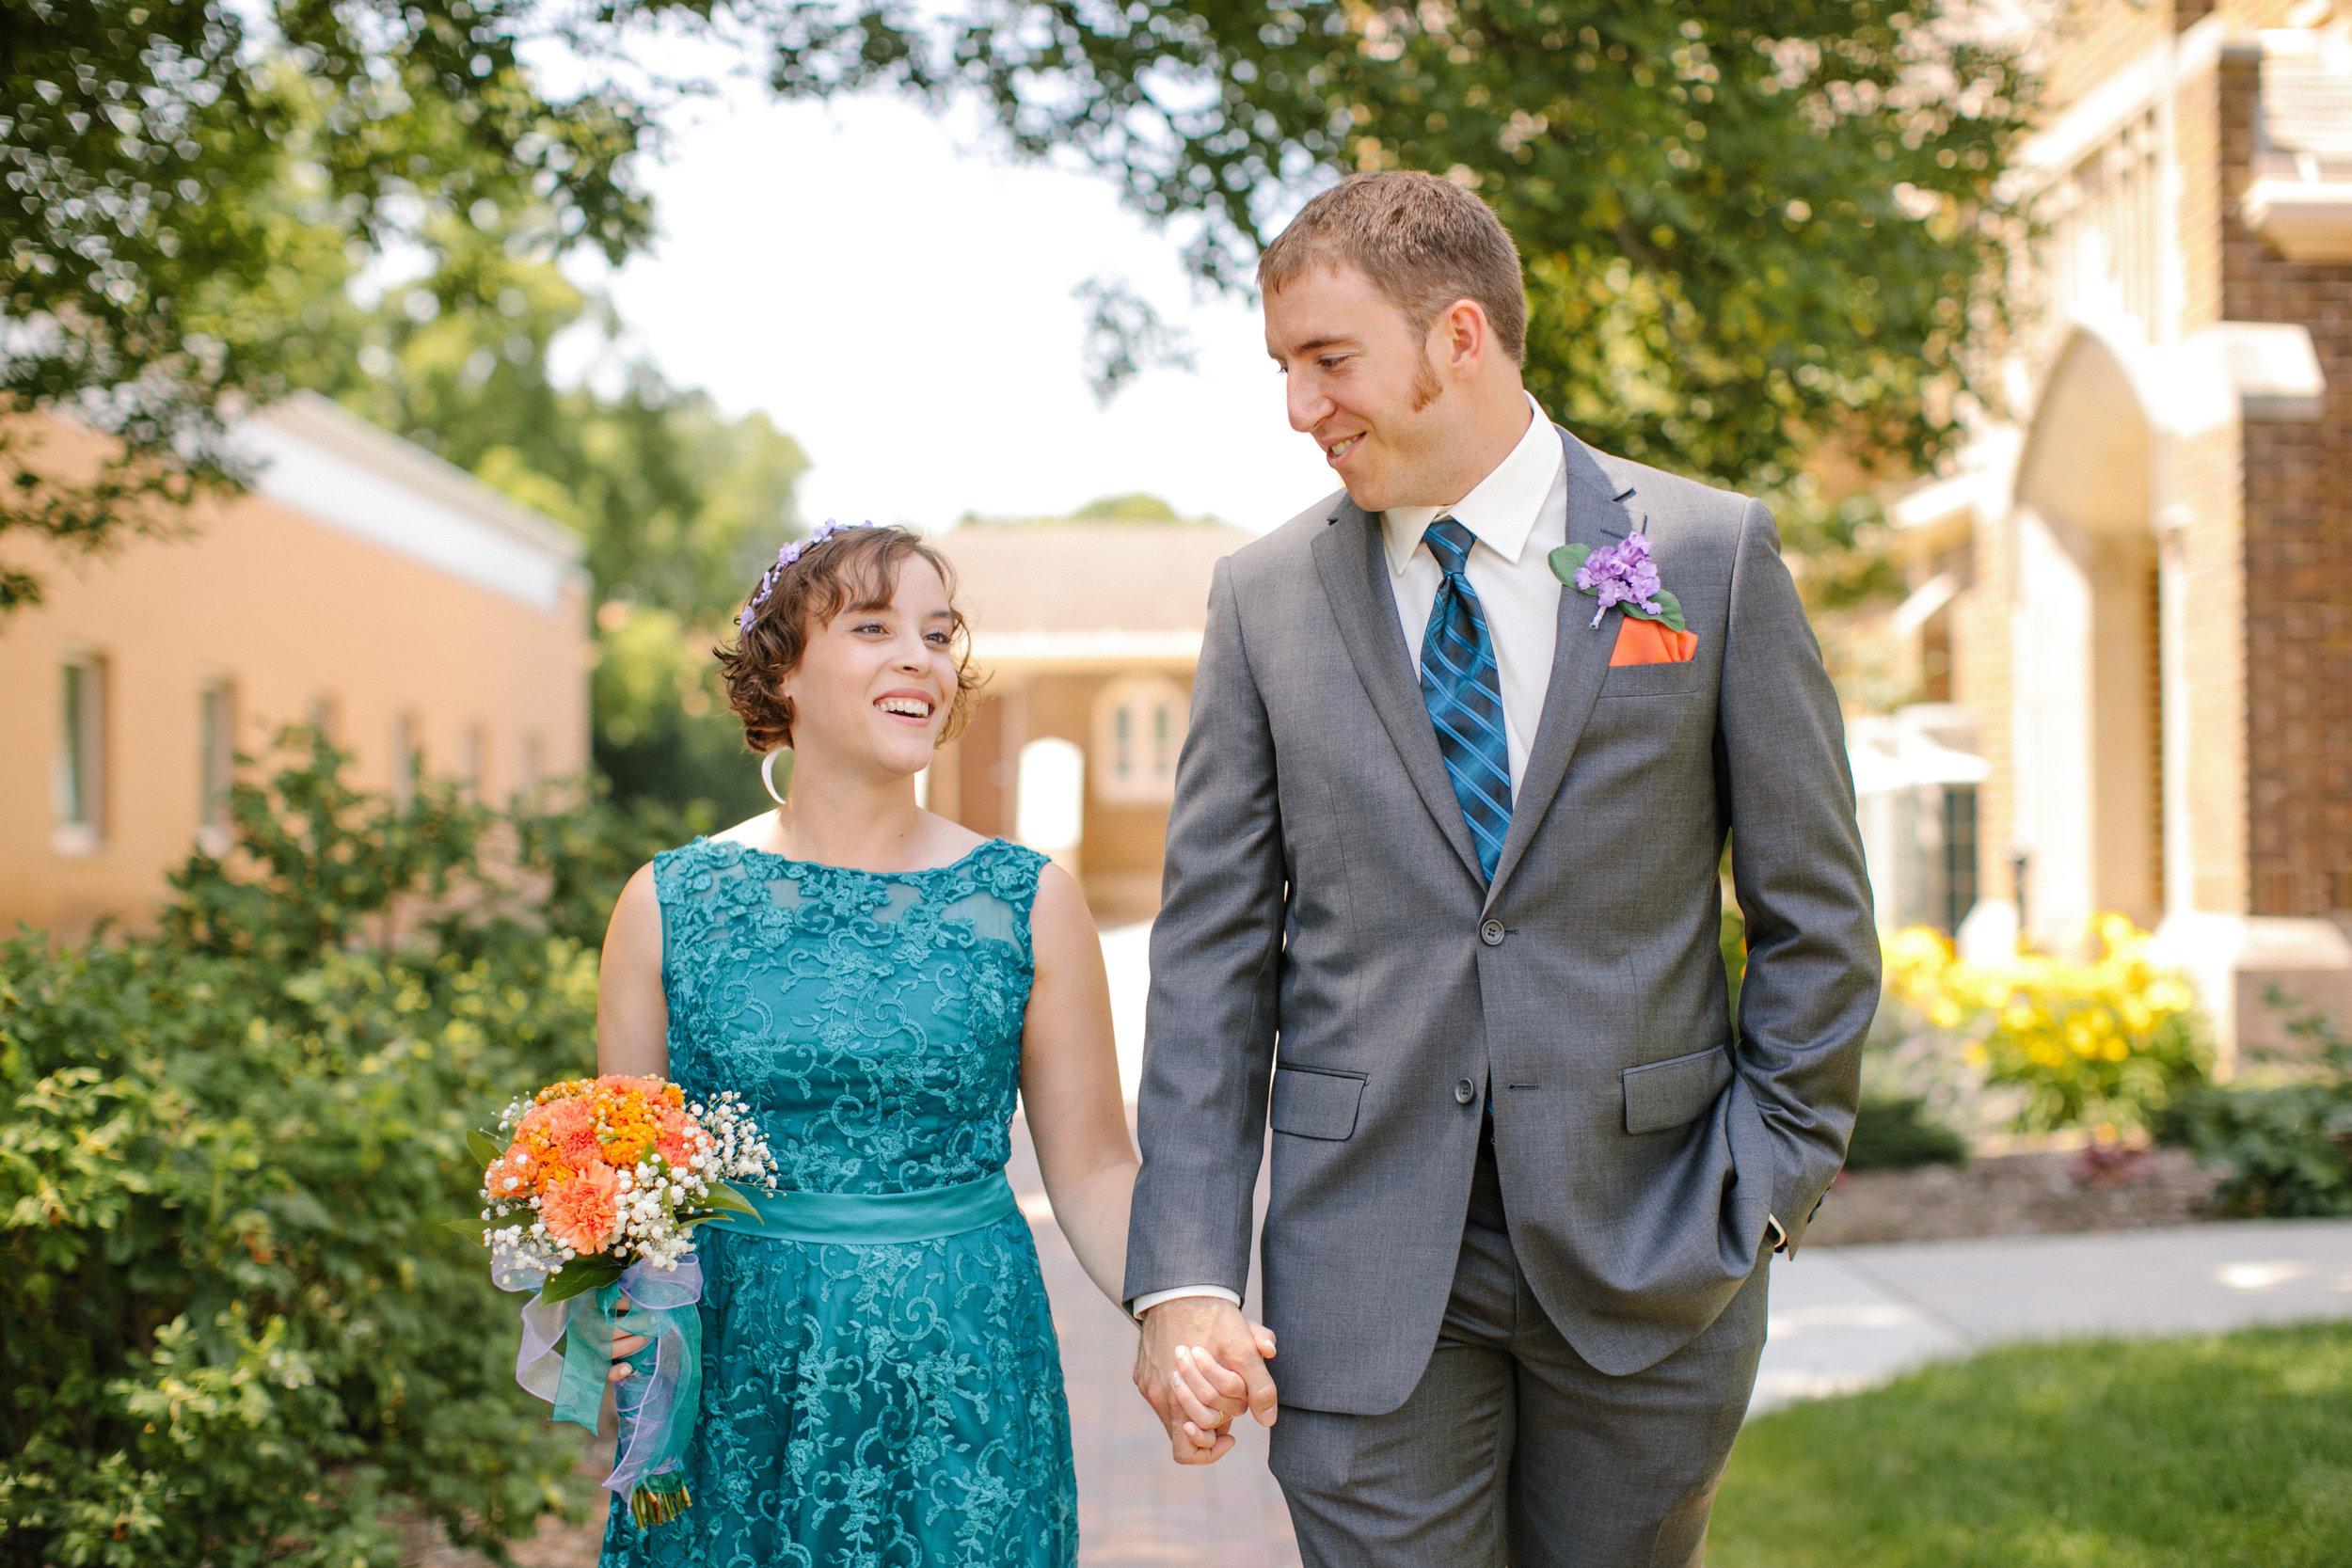 walking hand in hand on wedding day minnesota photographers